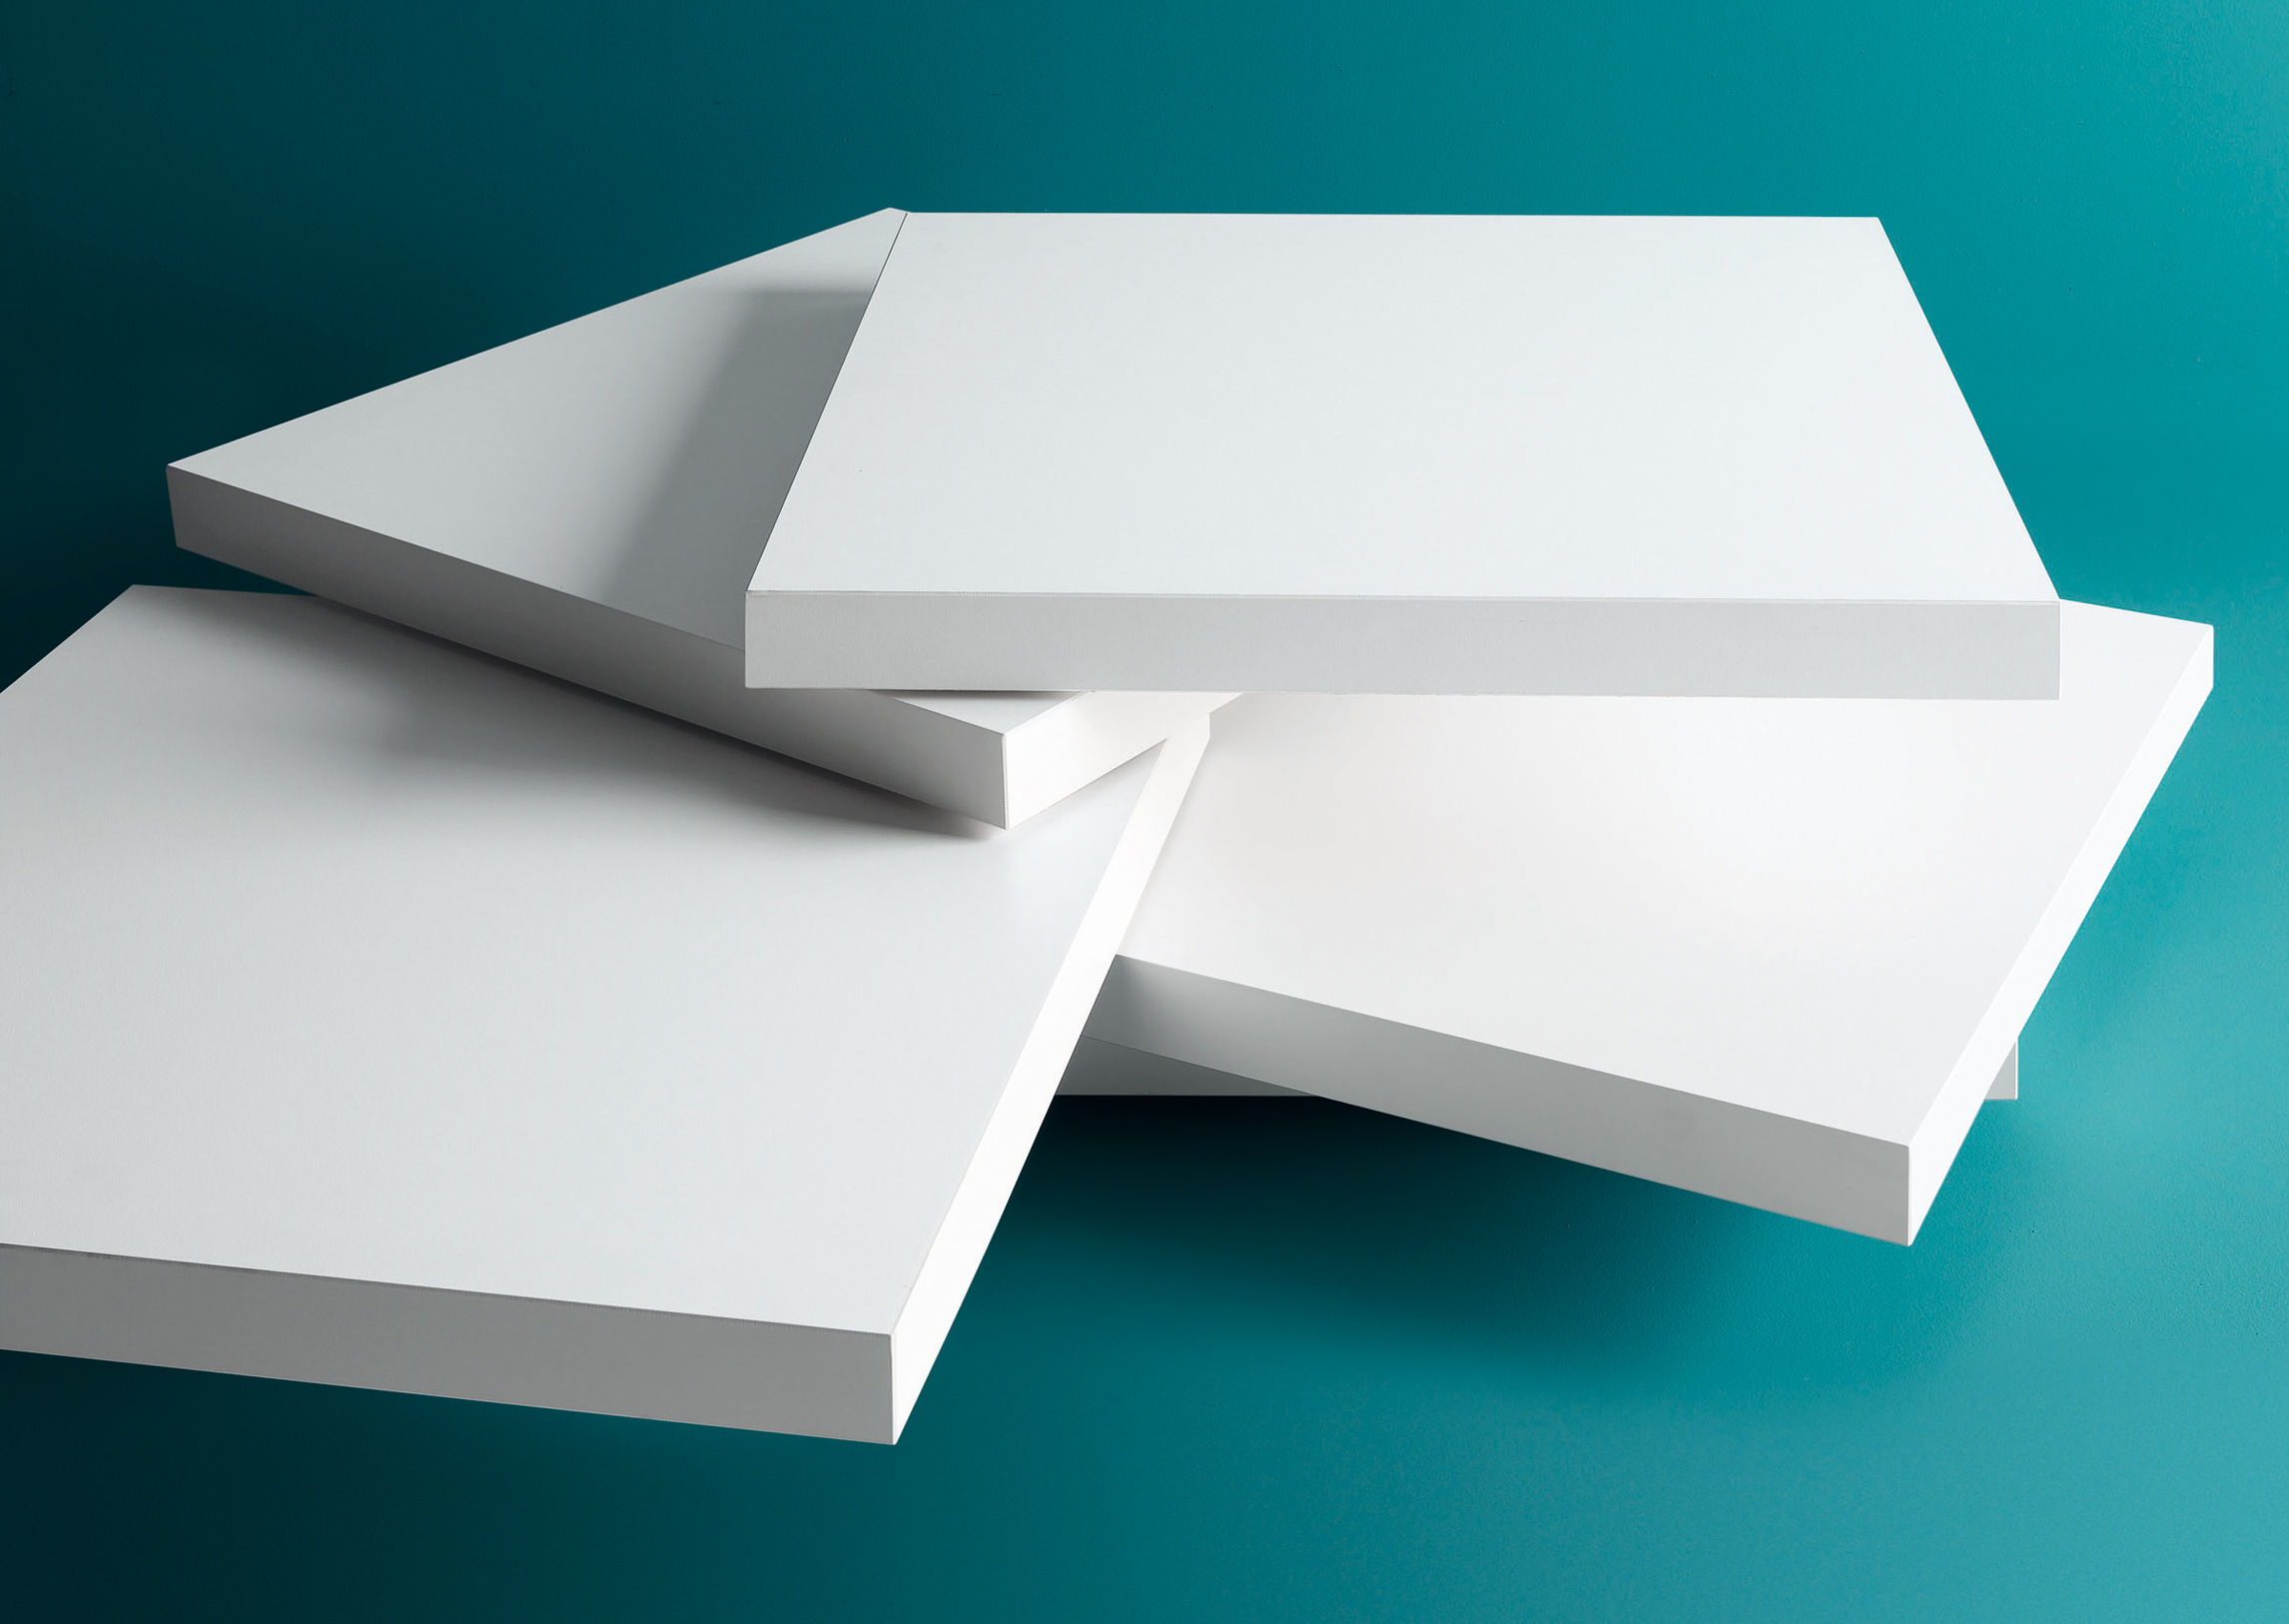 Table Basse Rotor Plateaux Pivotants Blanc Kristalia